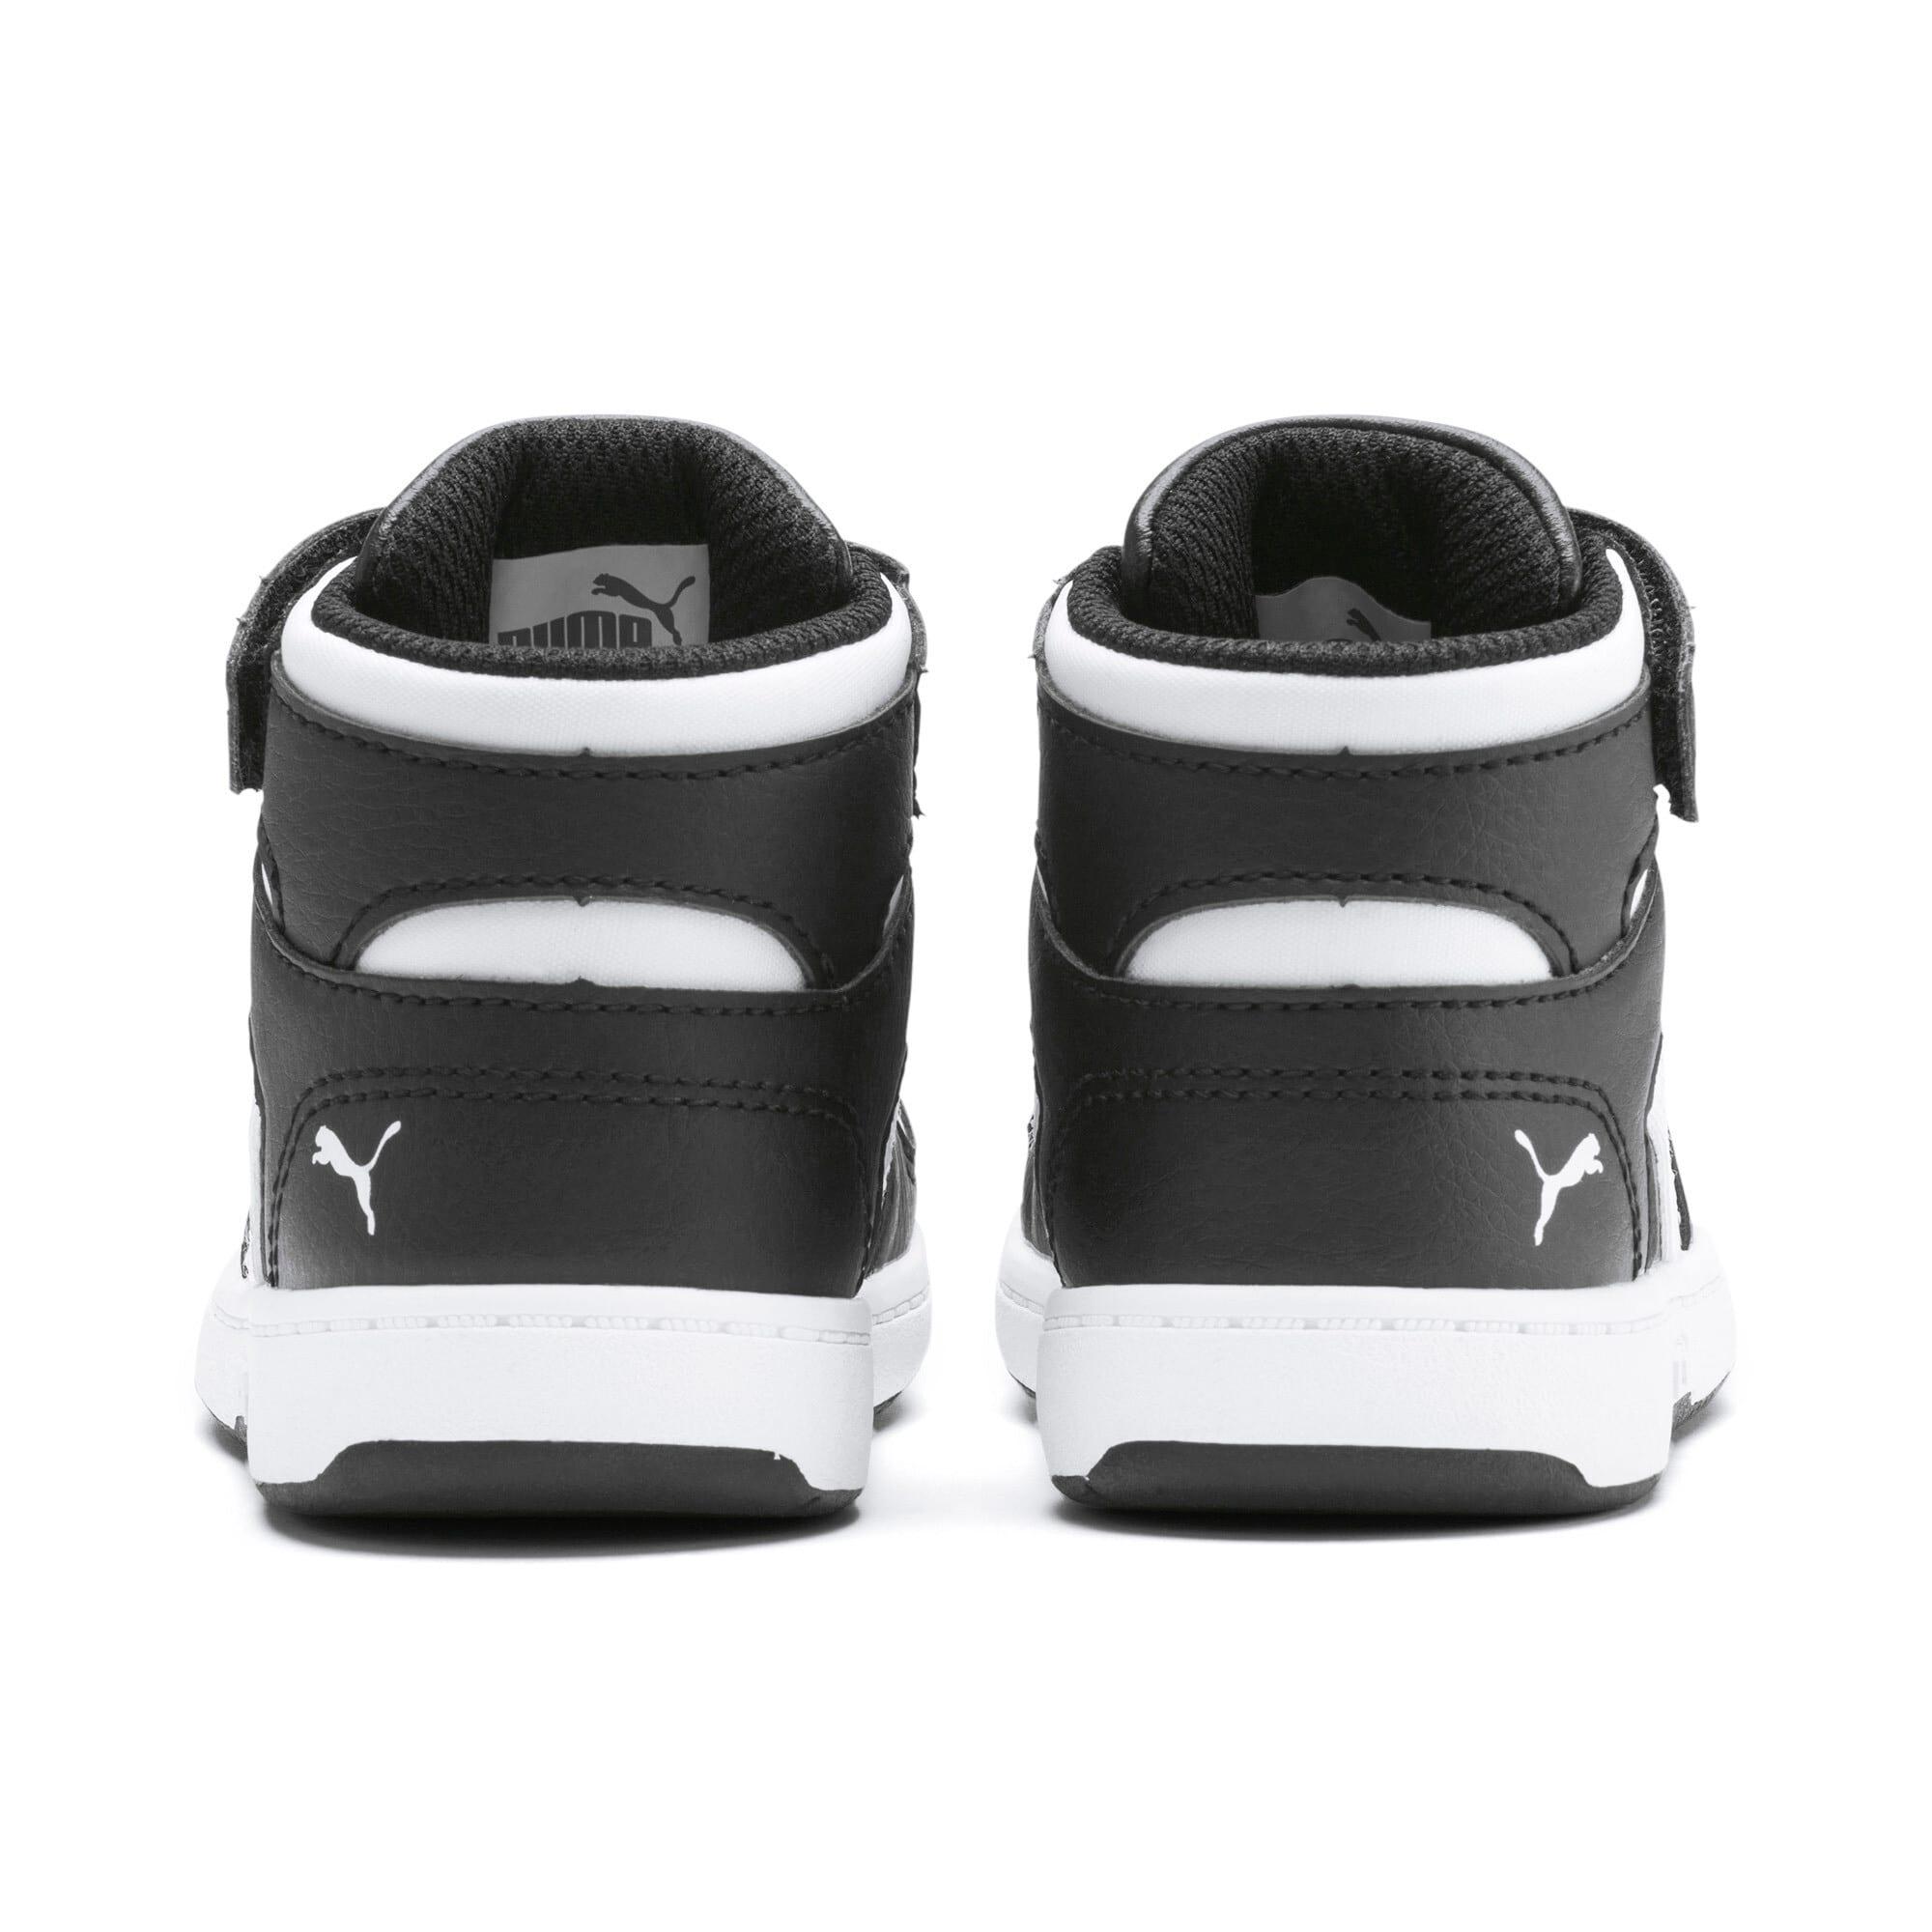 Thumbnail 3 of PUMA Rebound LayUp Toddler Shoes, Puma Black-Puma White, medium